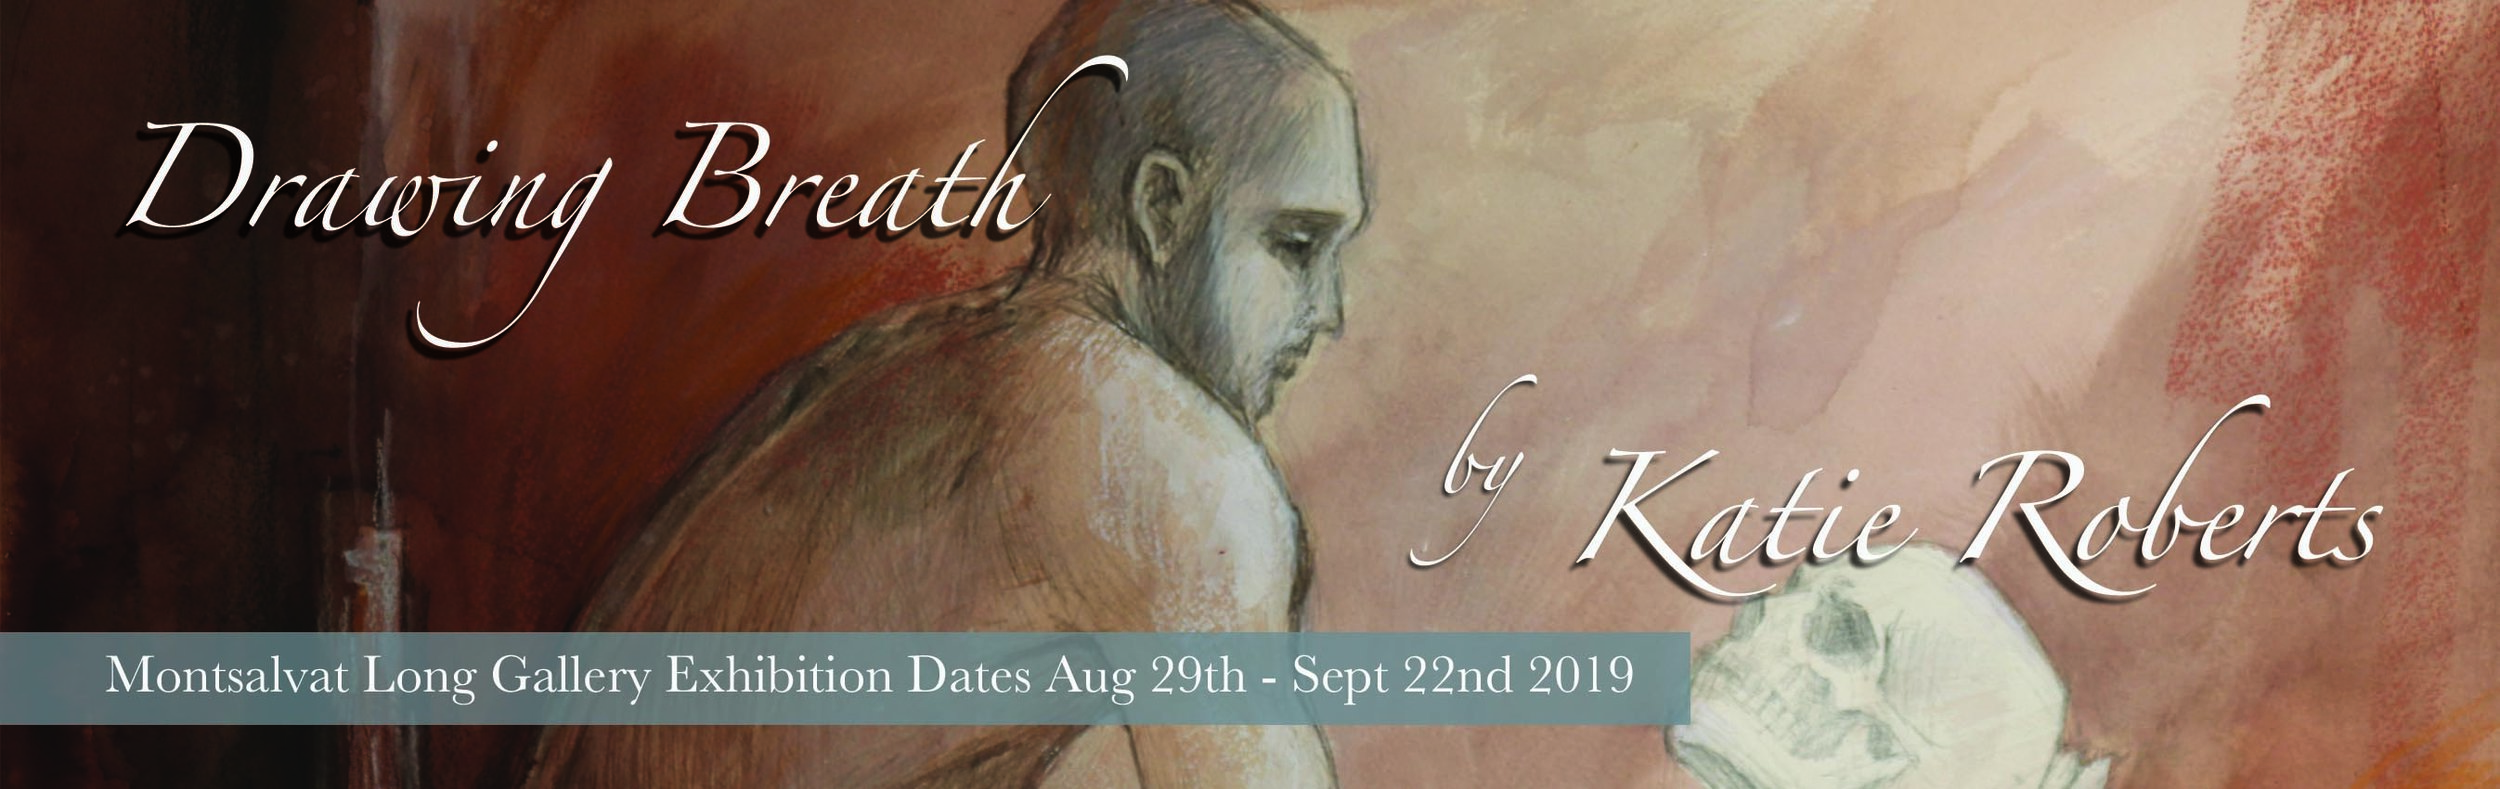 Montsalvat Exhibition Invite 2019.flat.jpg